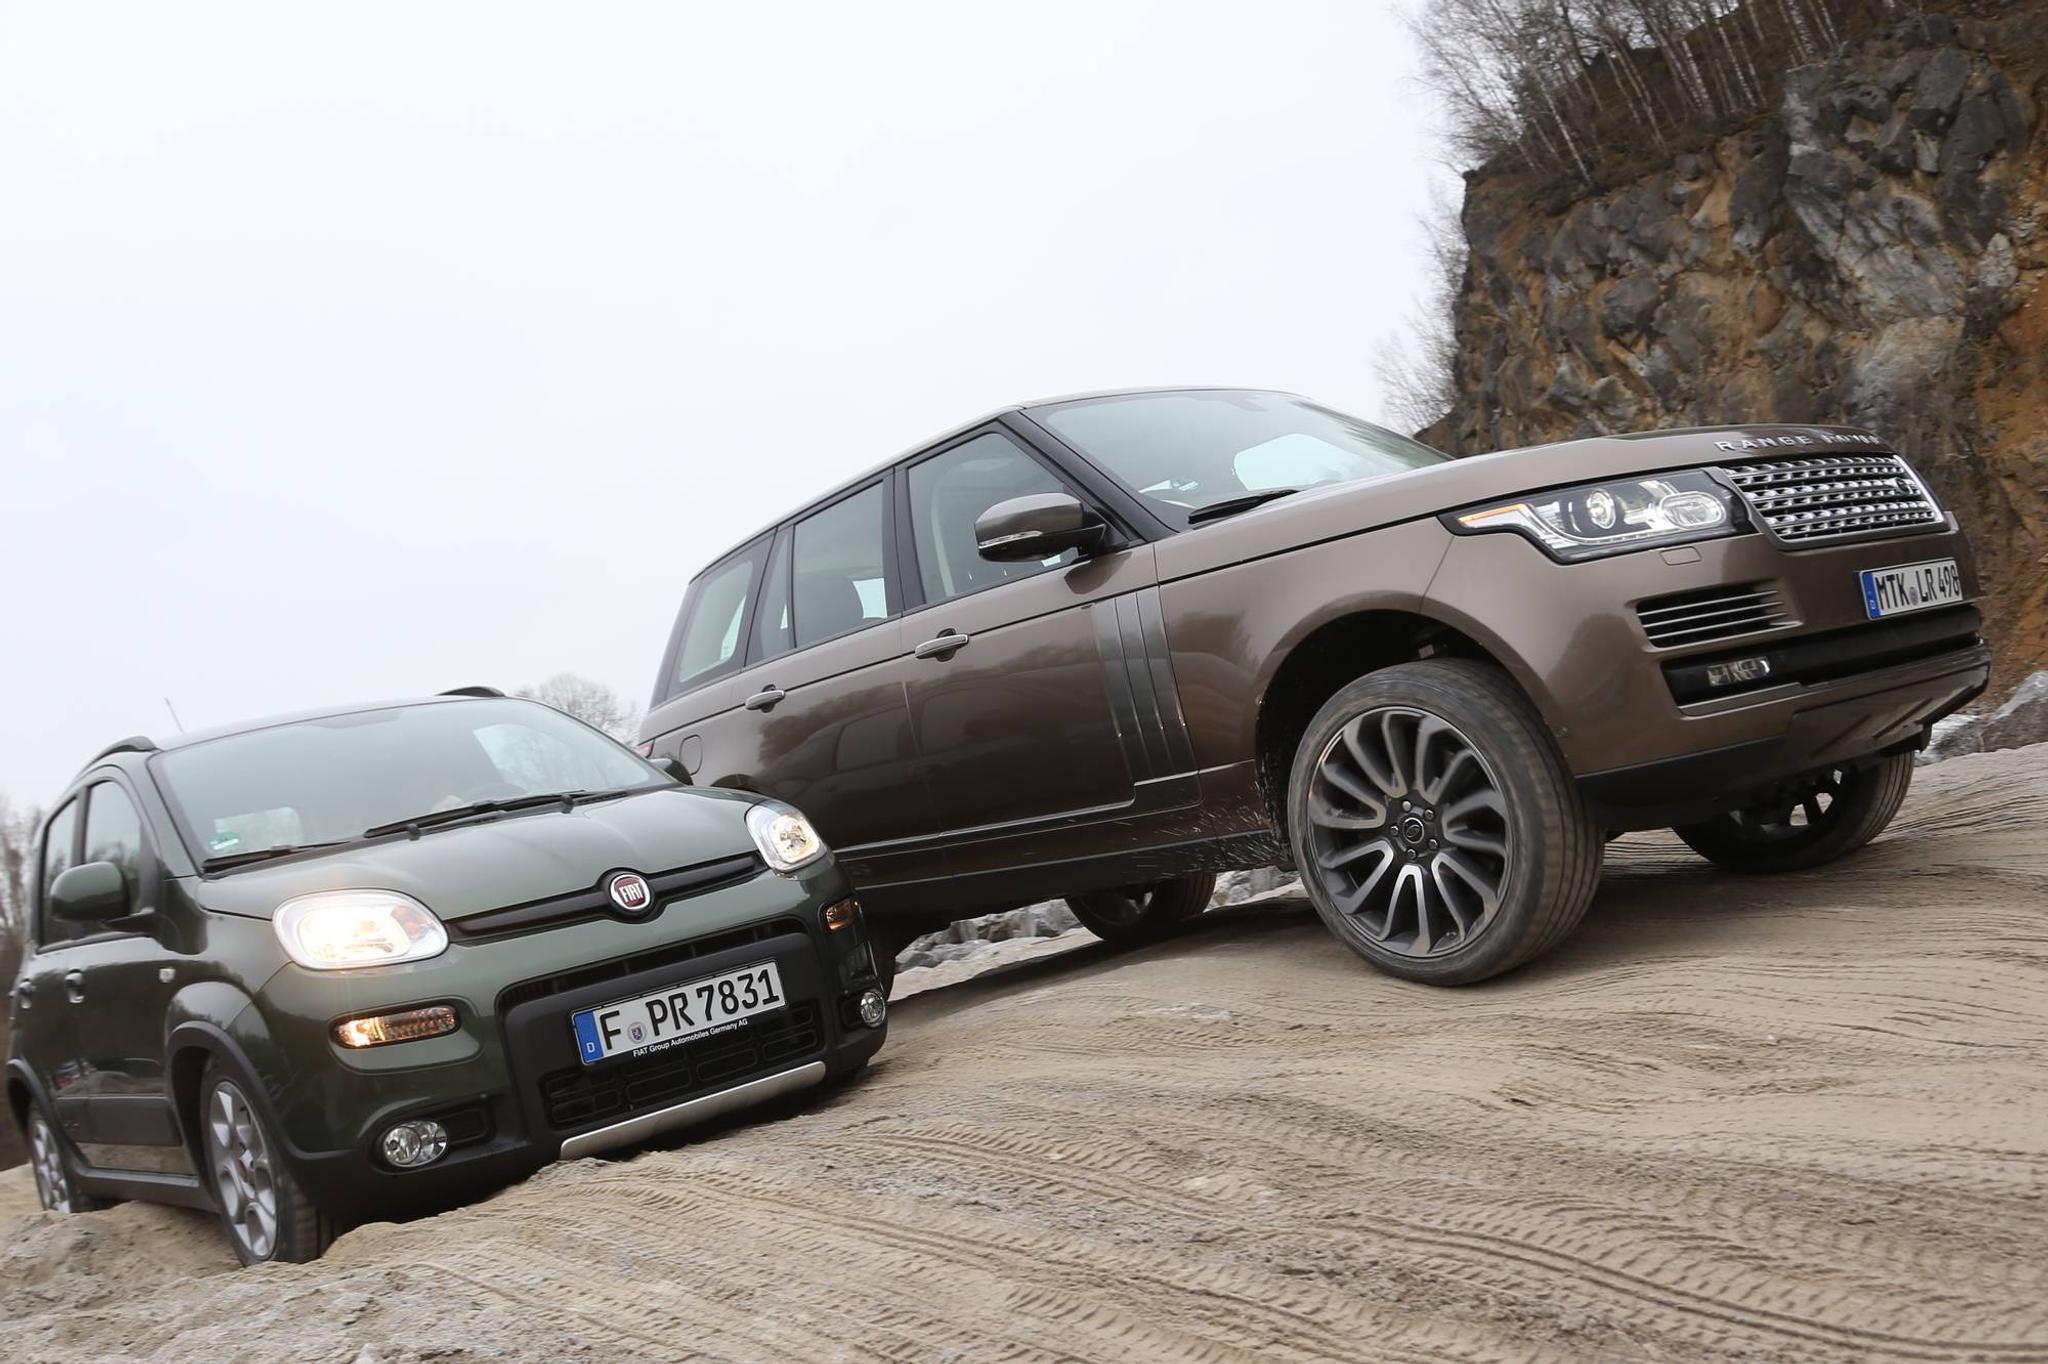 Fiat Panda 4x4 >> Fiat Panda 4x4 Kohtaa Range Roverin Tuulilasi